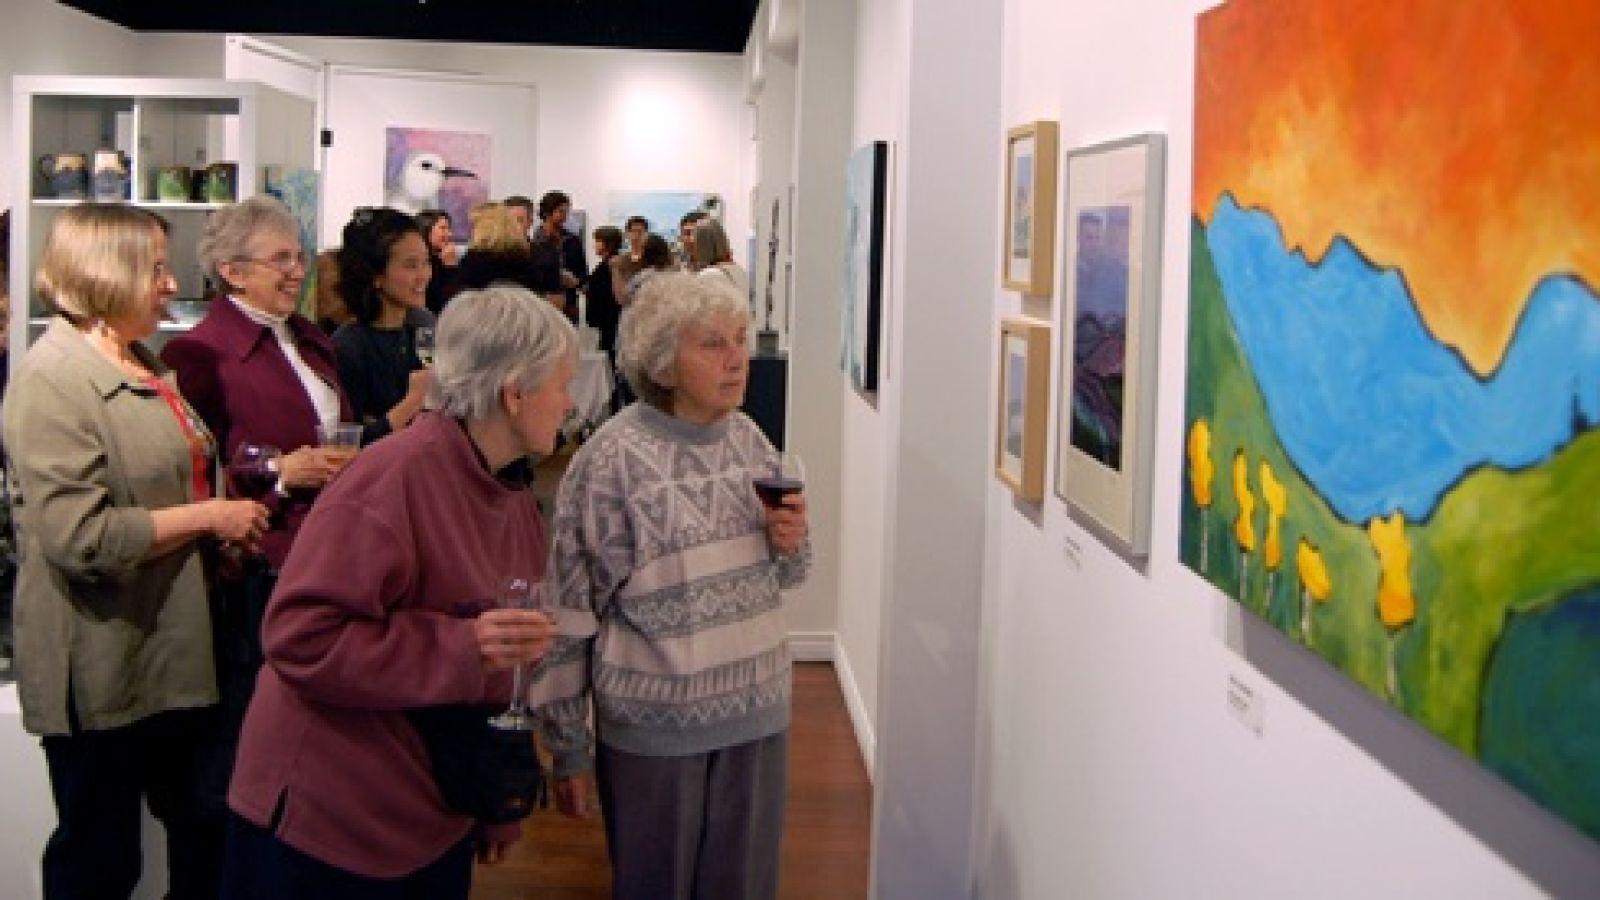 Many wonderful art showings.